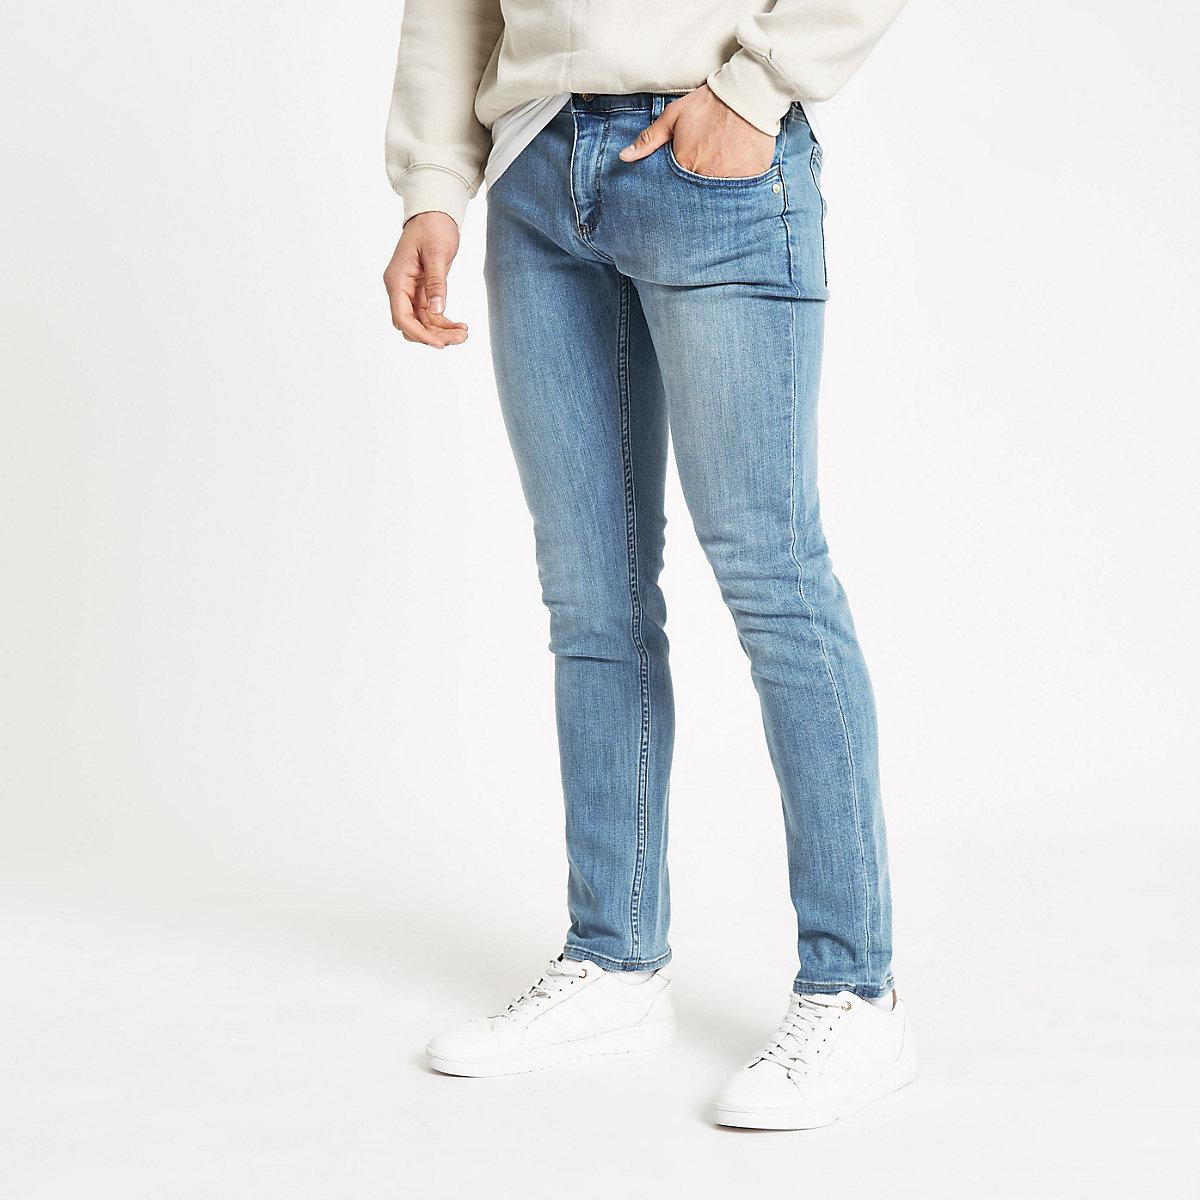 Monkee Genes light blue skinny jeans